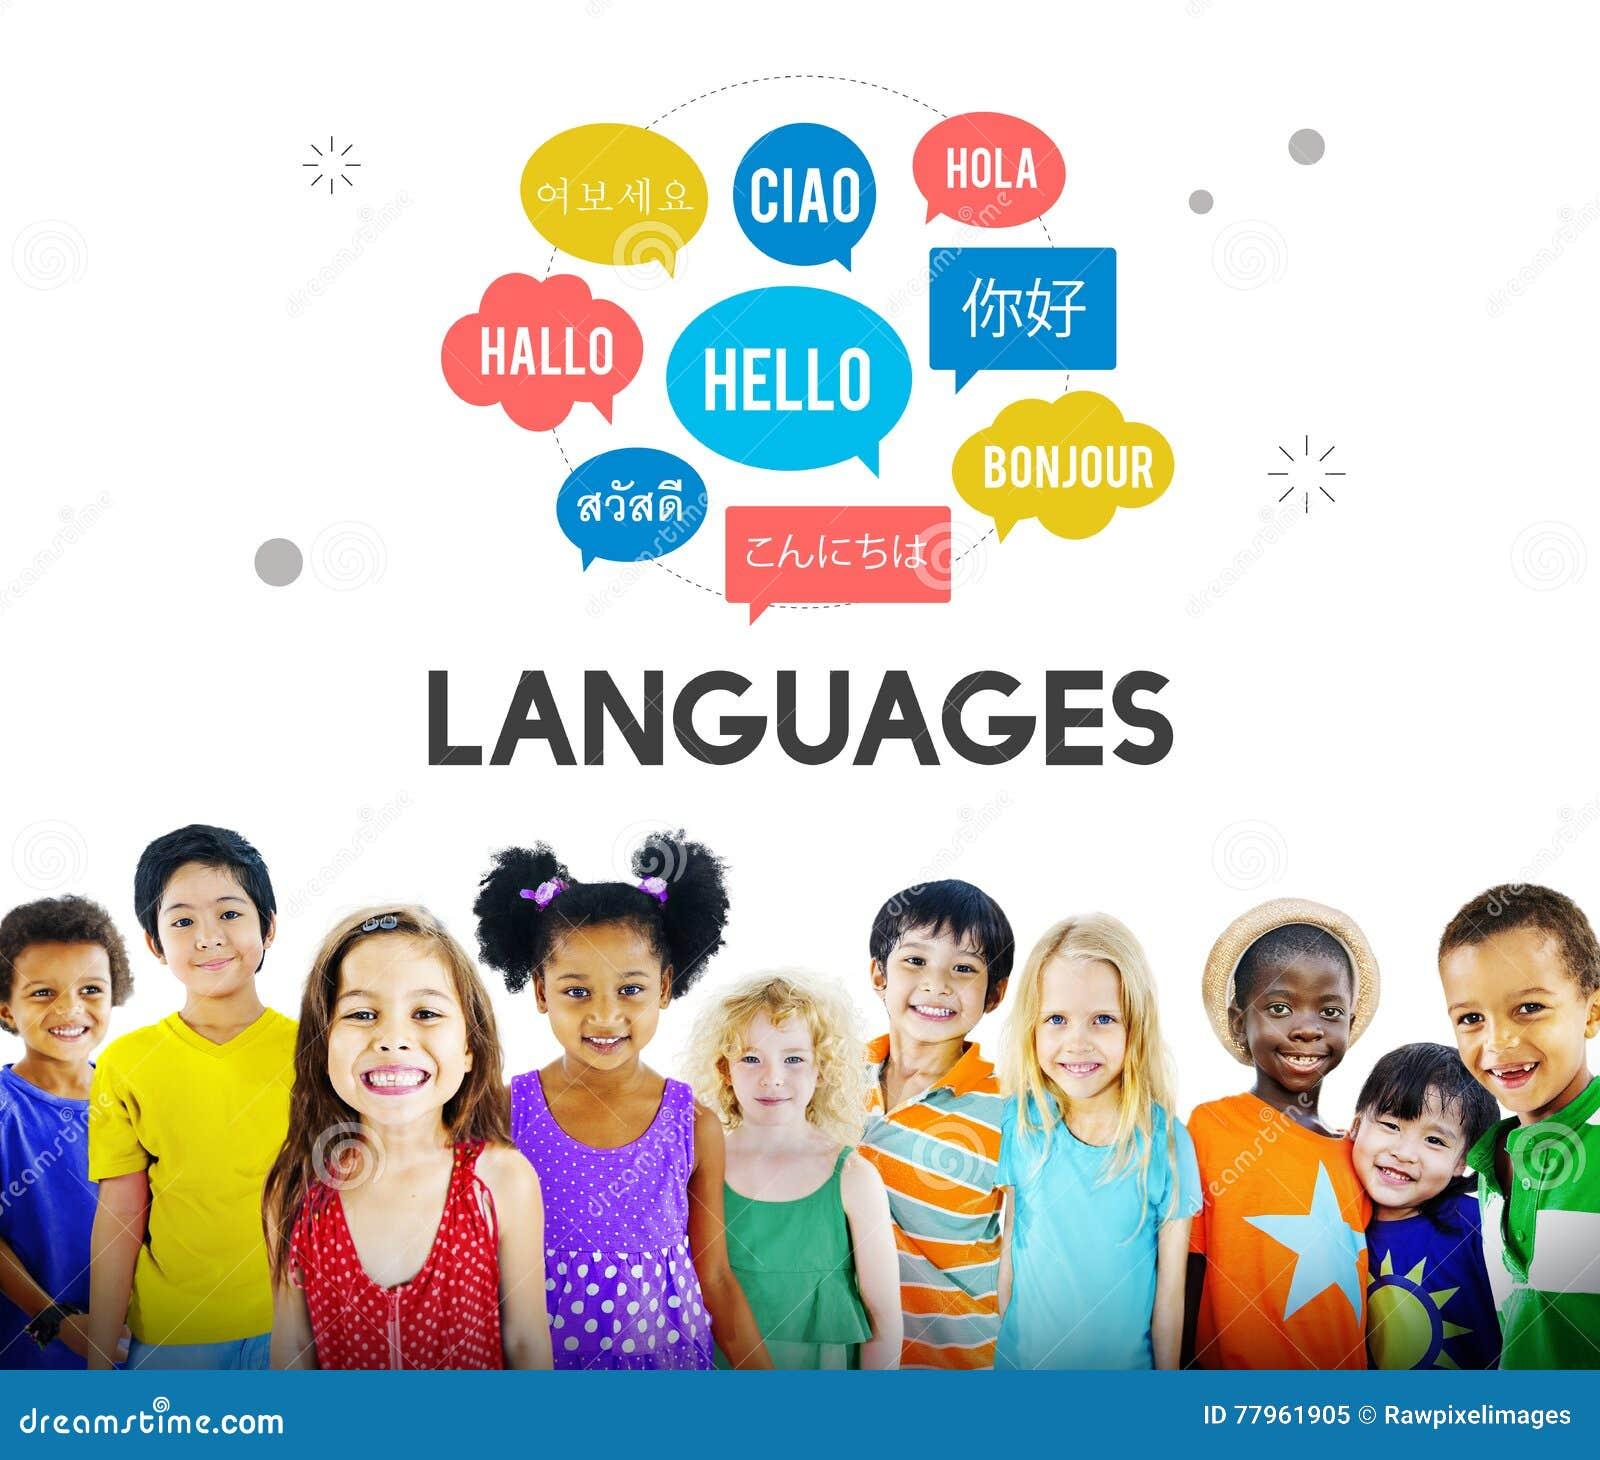 Multilingual greetings languages concept stock image image of ciao multilingual greetings languages kids concept m4hsunfo